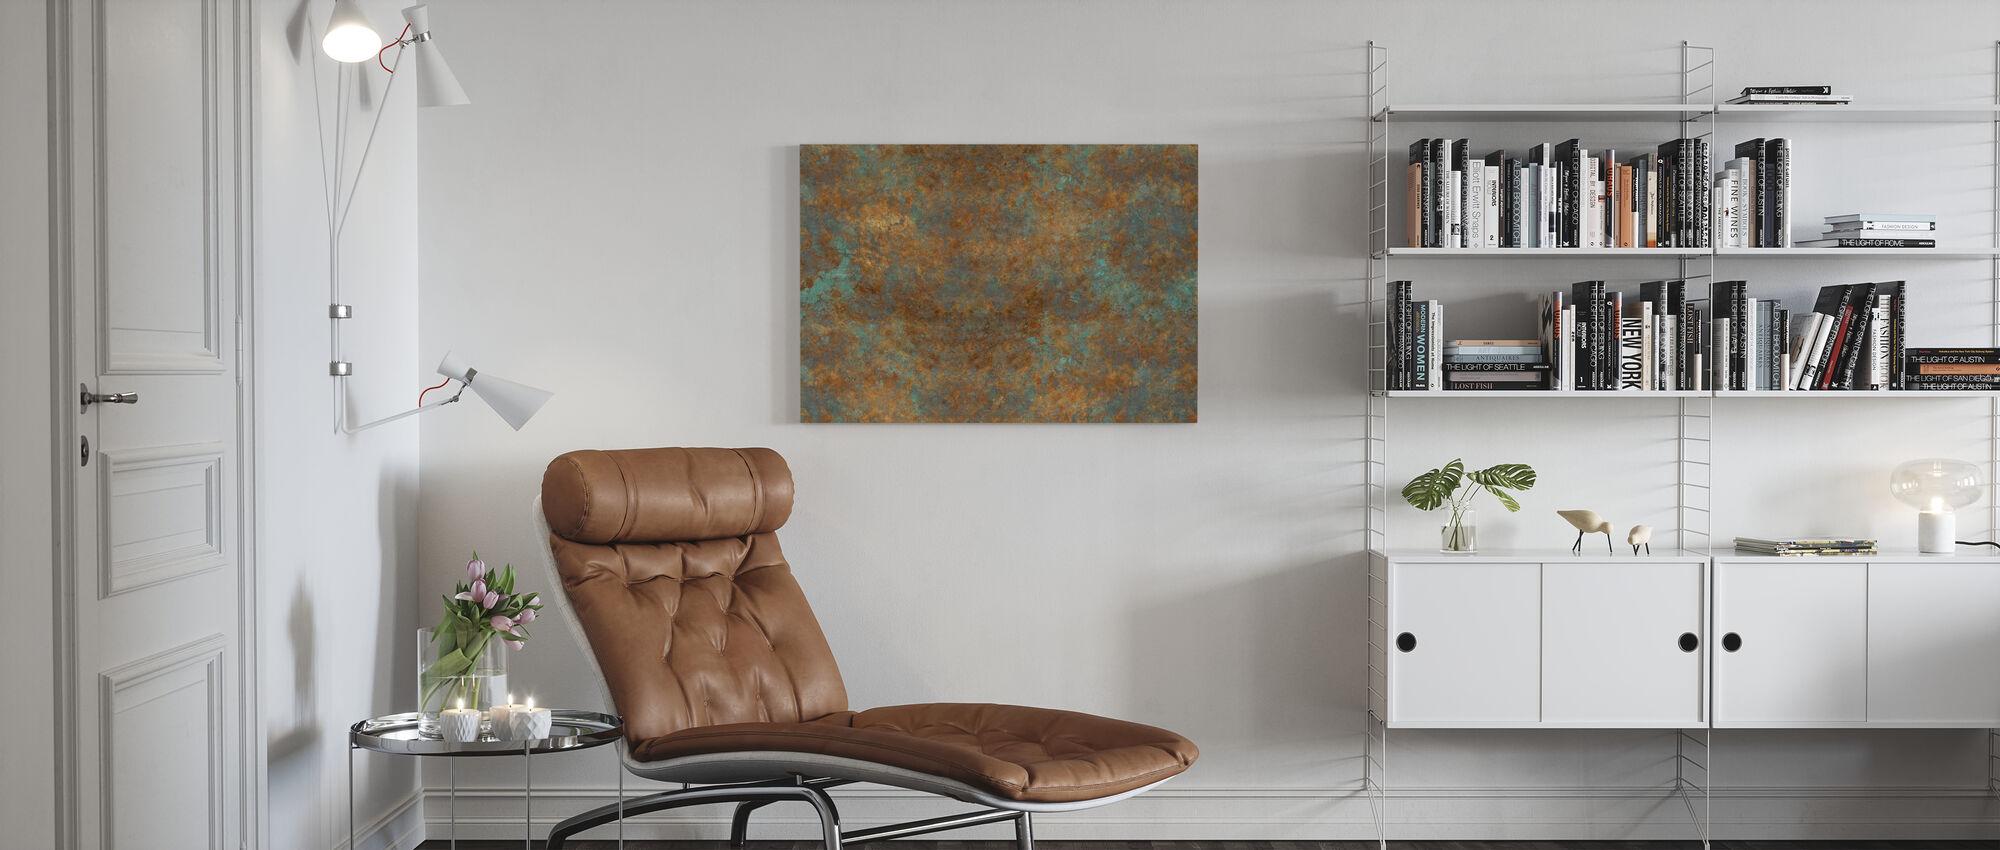 Vintage Bronze Background - Canvas print - Living Room